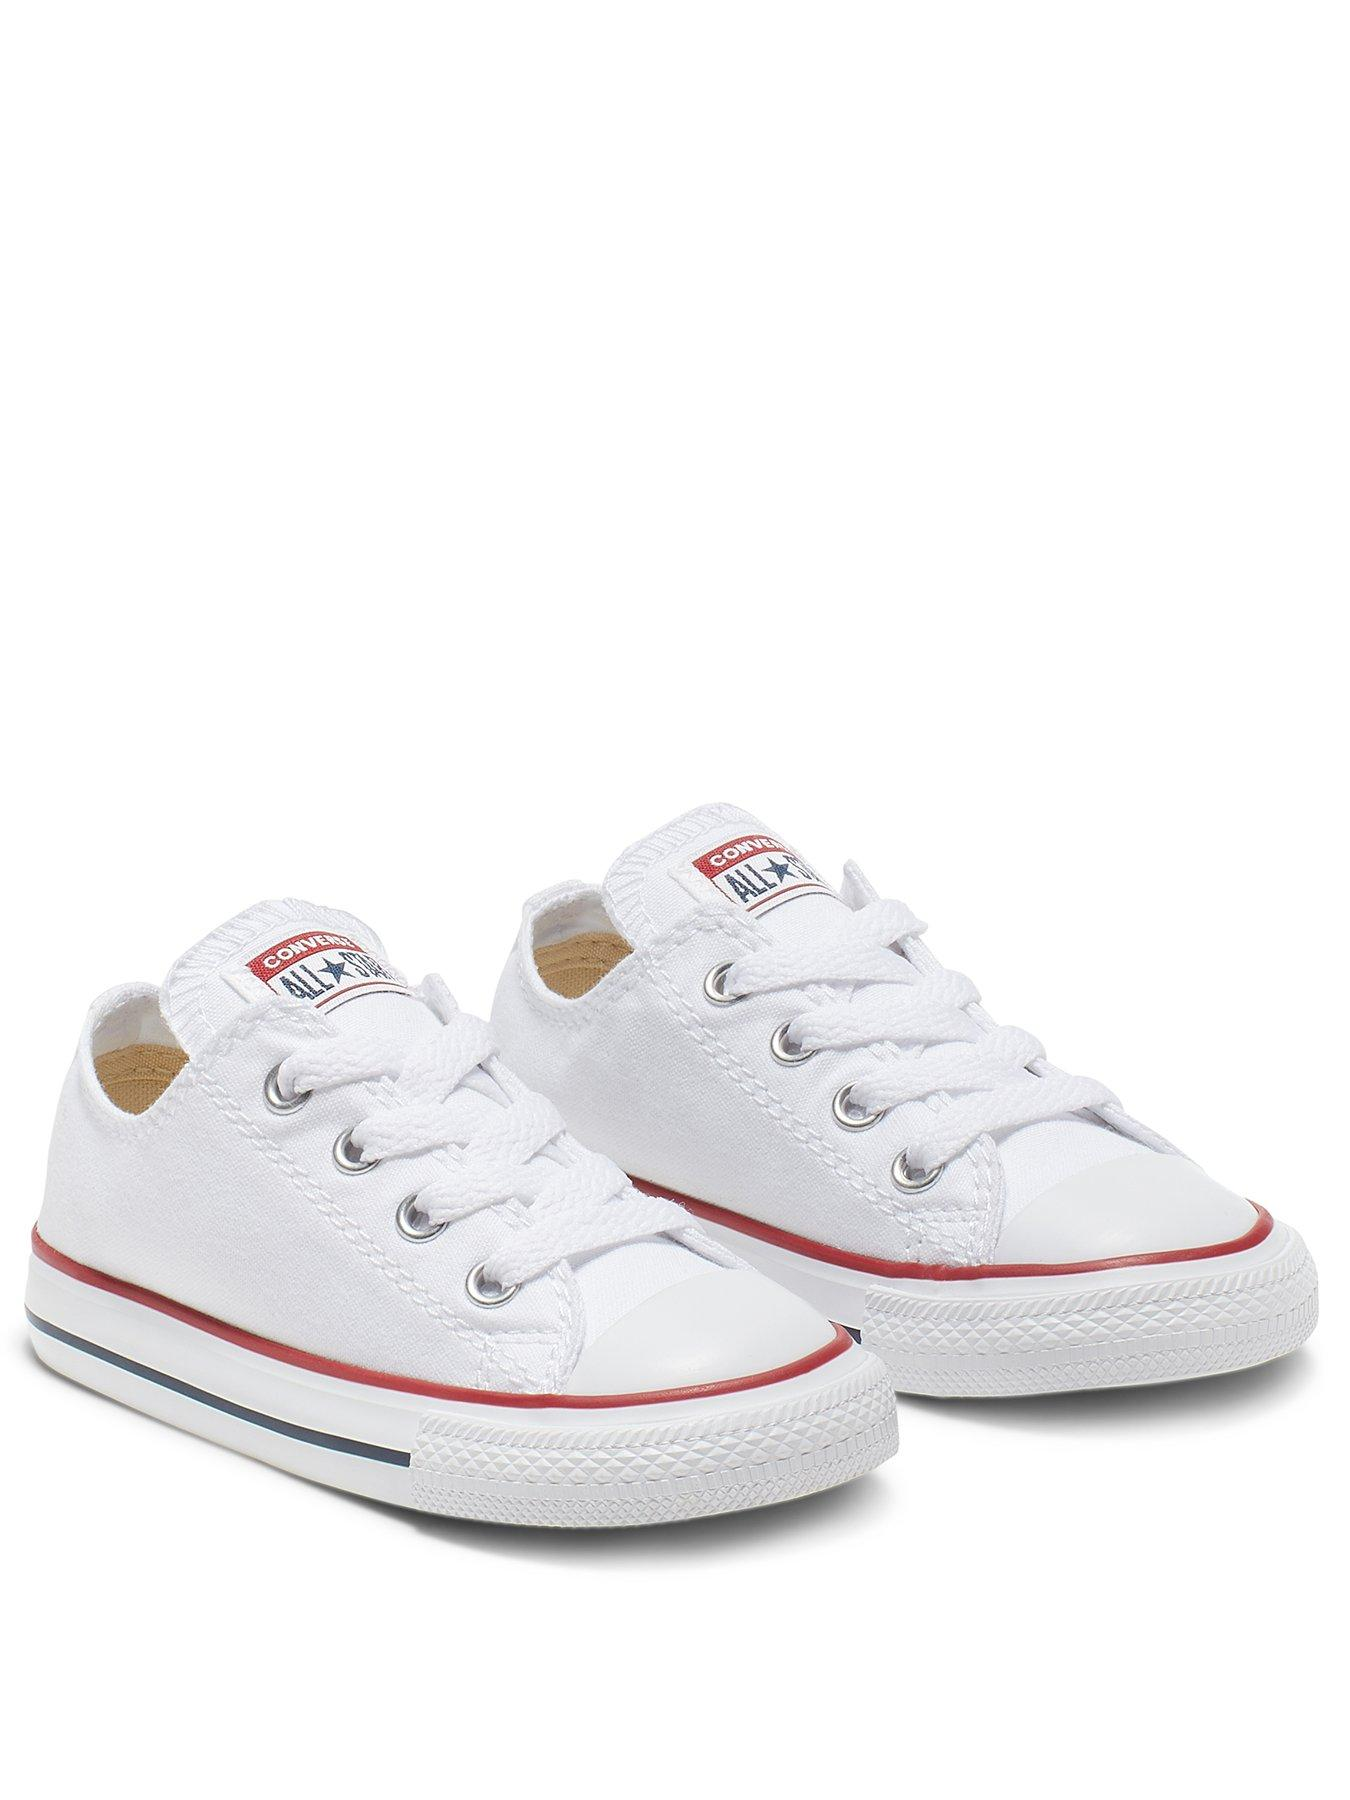 girls white converse size 3